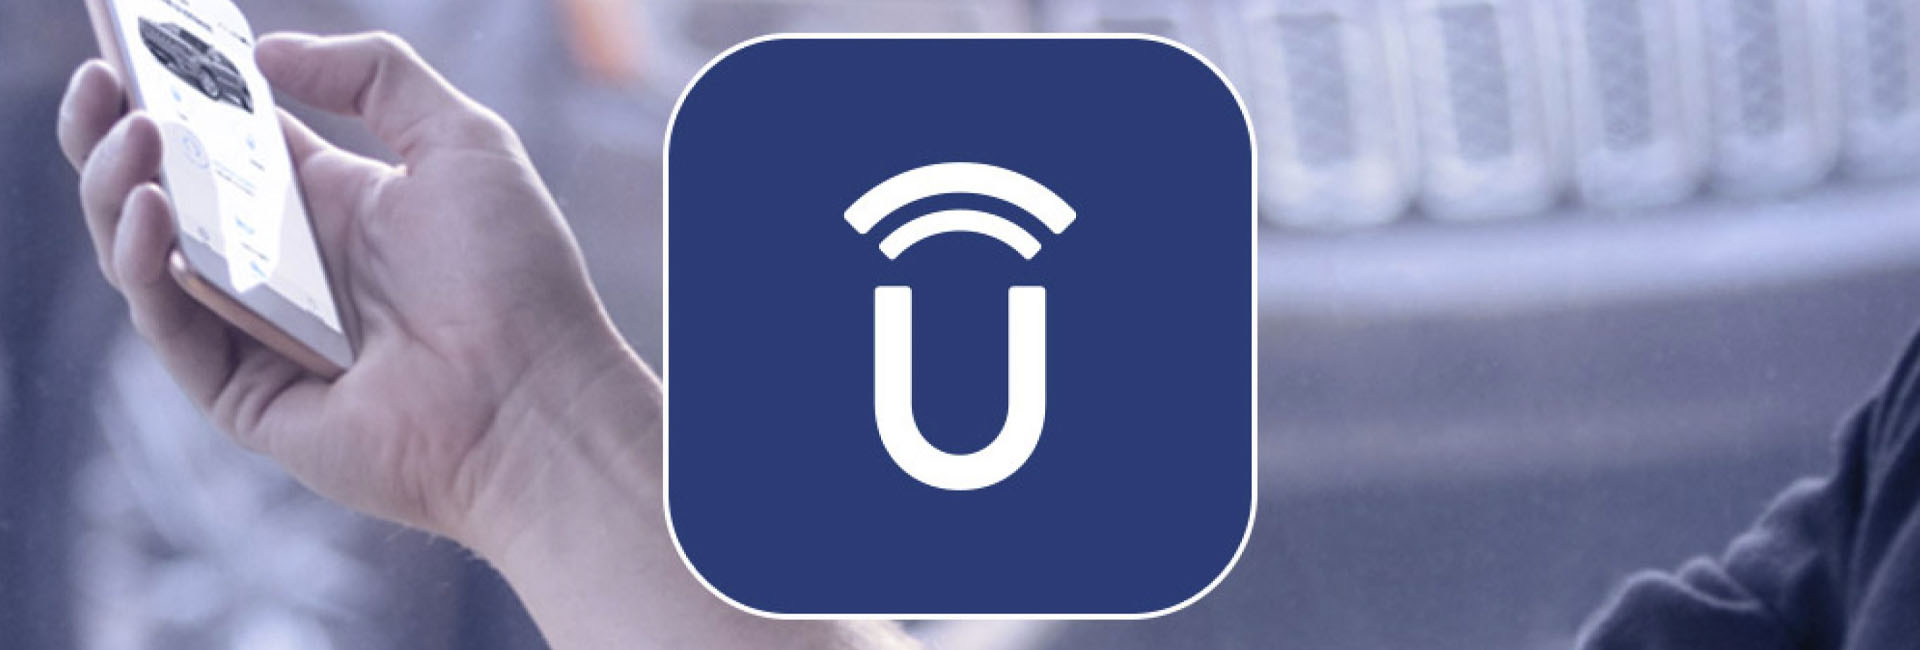 UConnect App